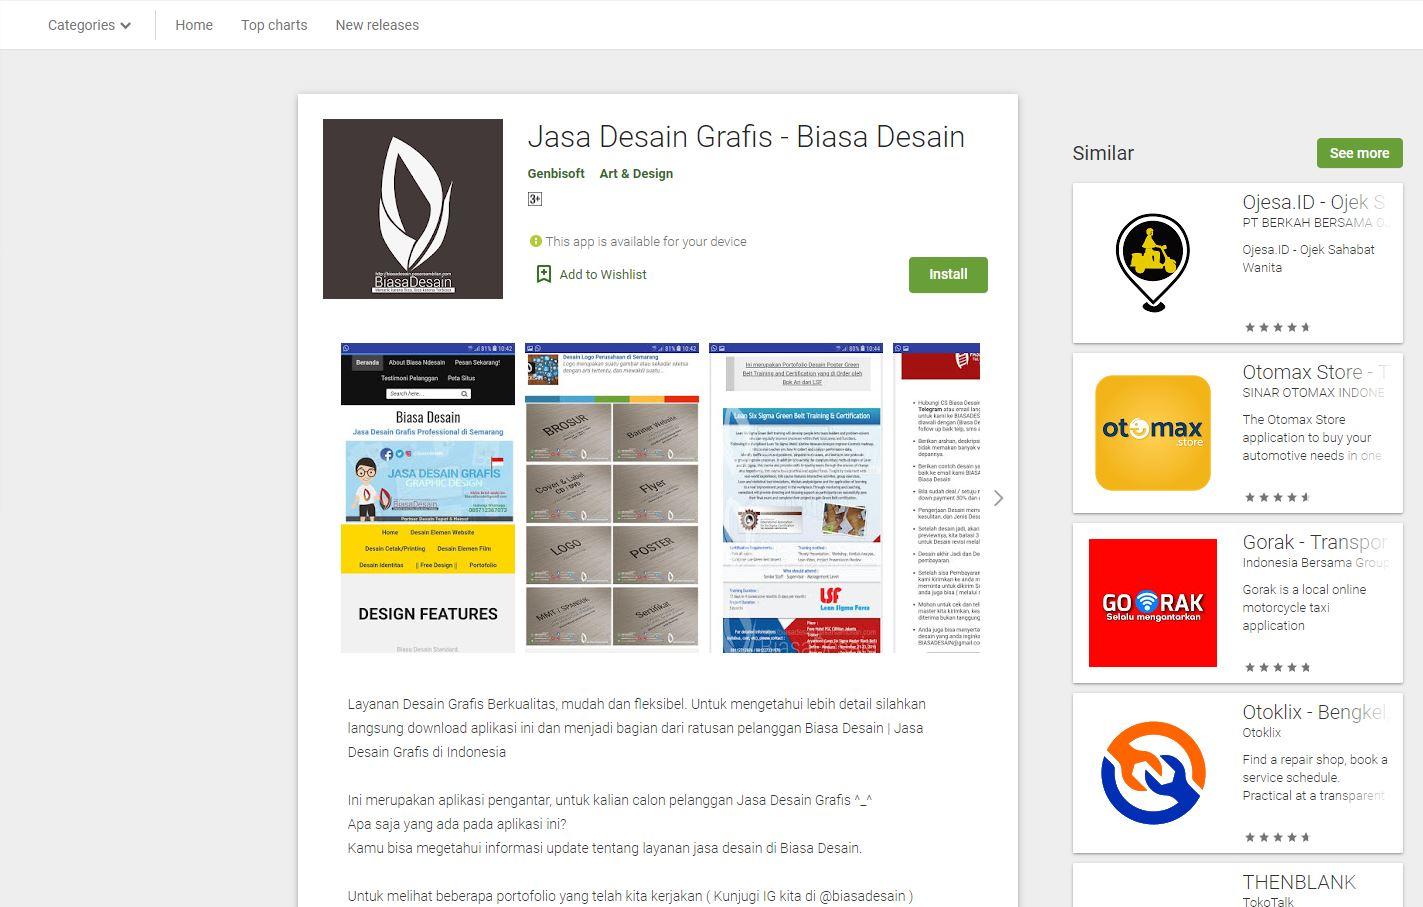 genbisoft aplikasi desain grafis overview